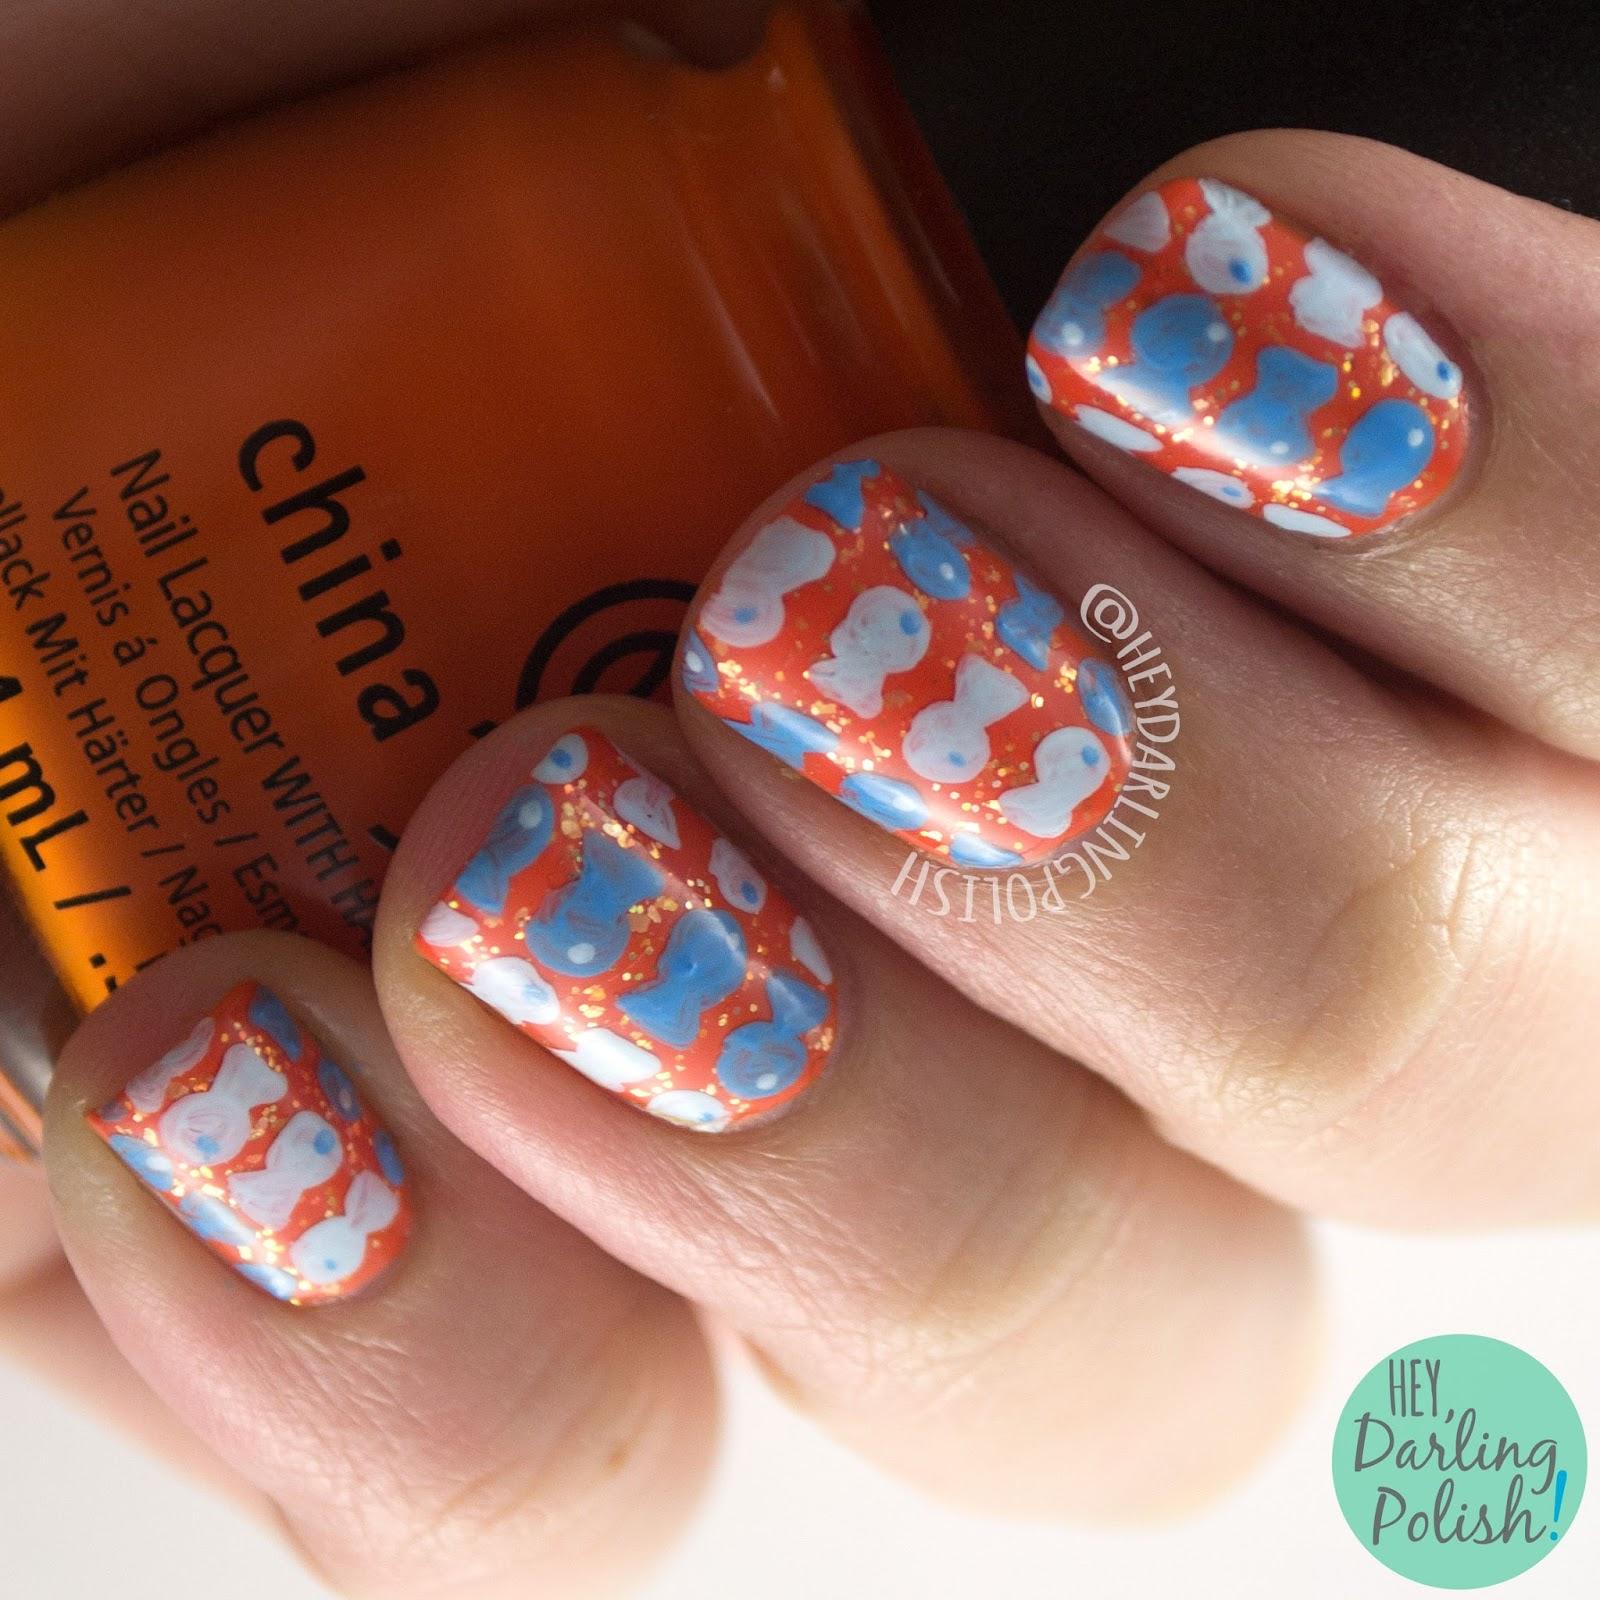 nails, nail art, nail polish, orange, blue, goldfish, fish, pattern, freehand, hey darling polish, 2015 cnt 31 day challenge